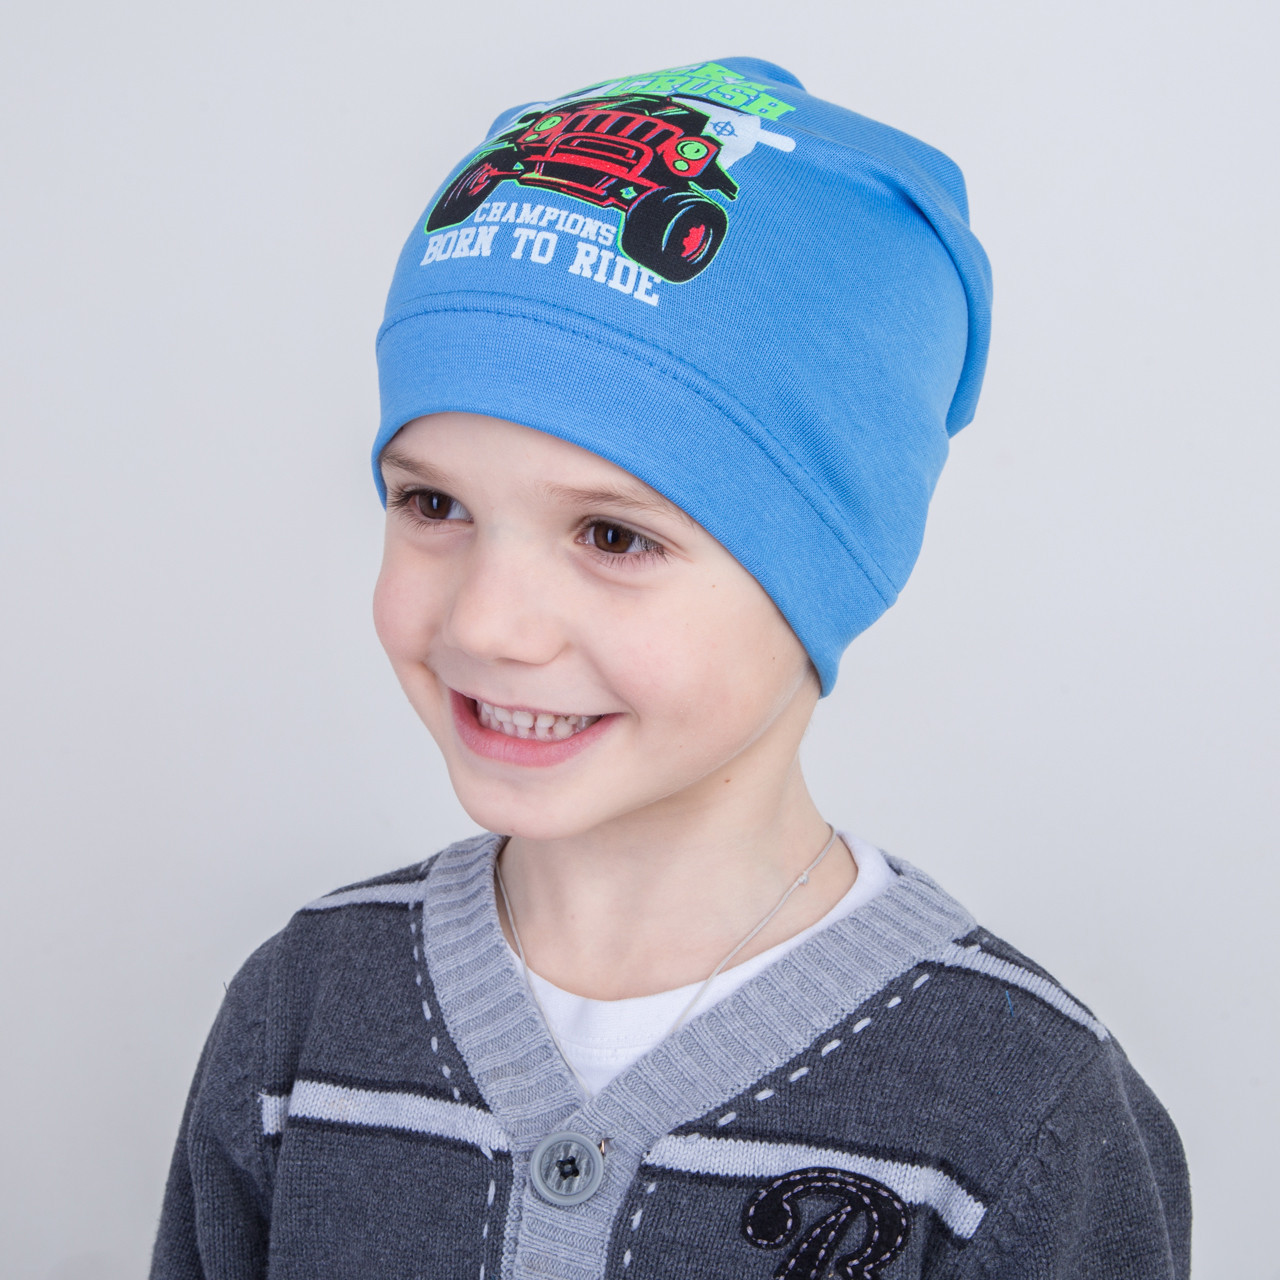 Весенняя шапка для мальчика на весну - Хамер - Артикул 2249